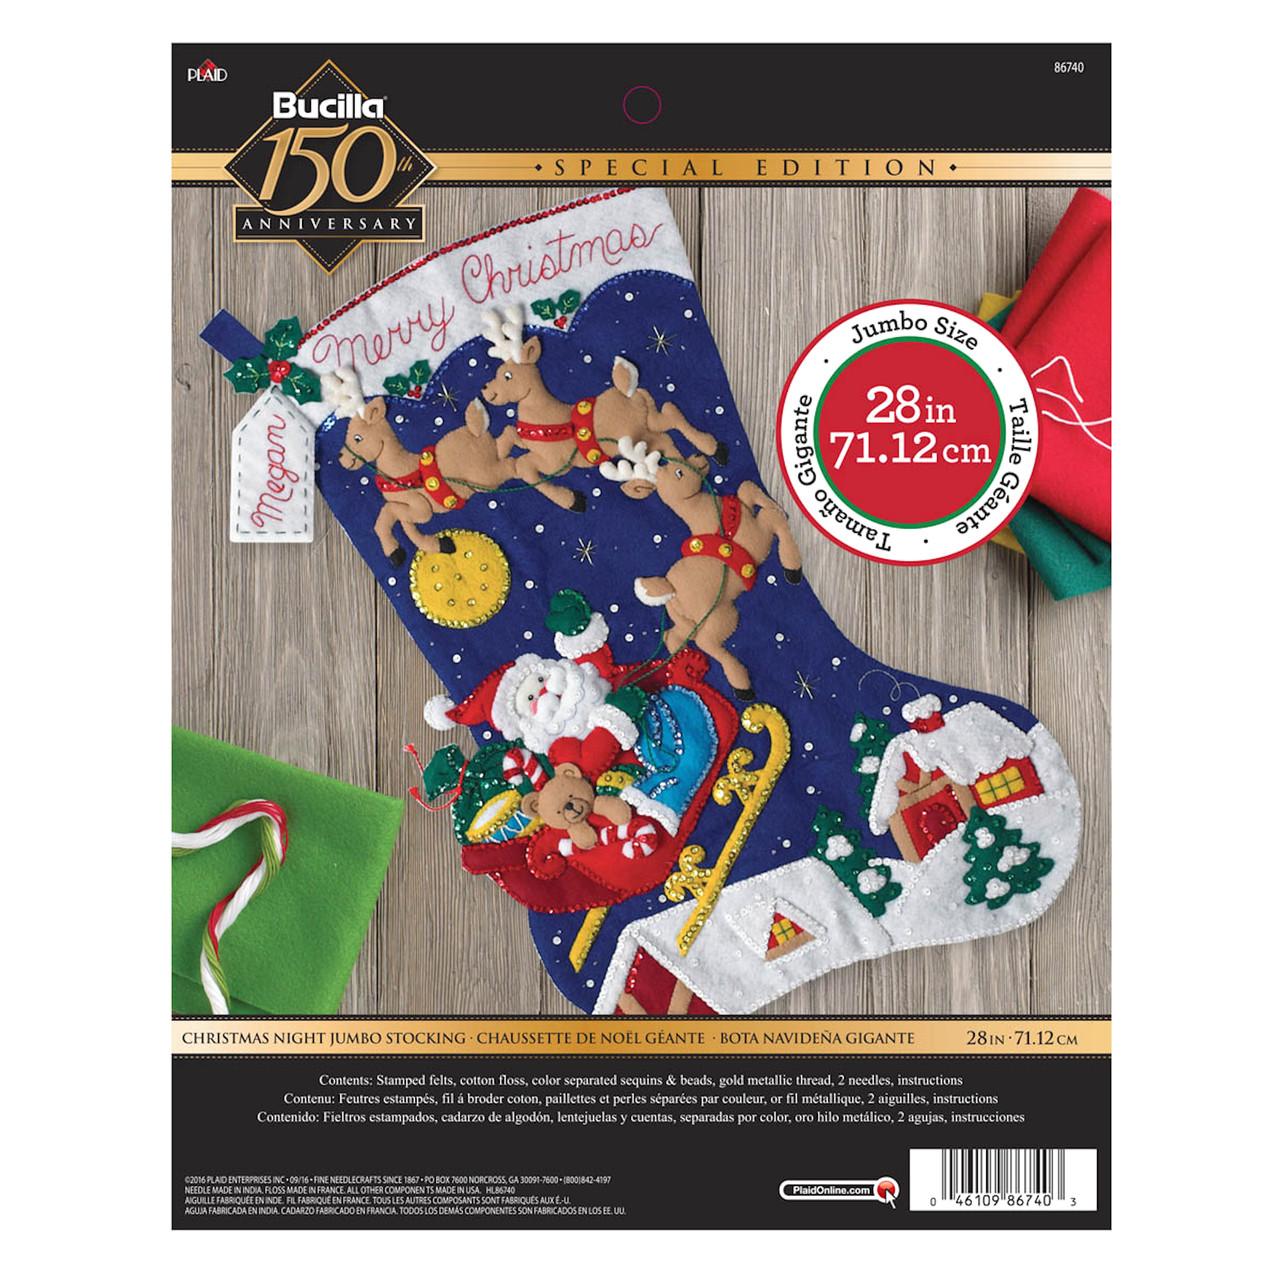 Plaid / Bucilla - Christmas Night Jumbo Stocking